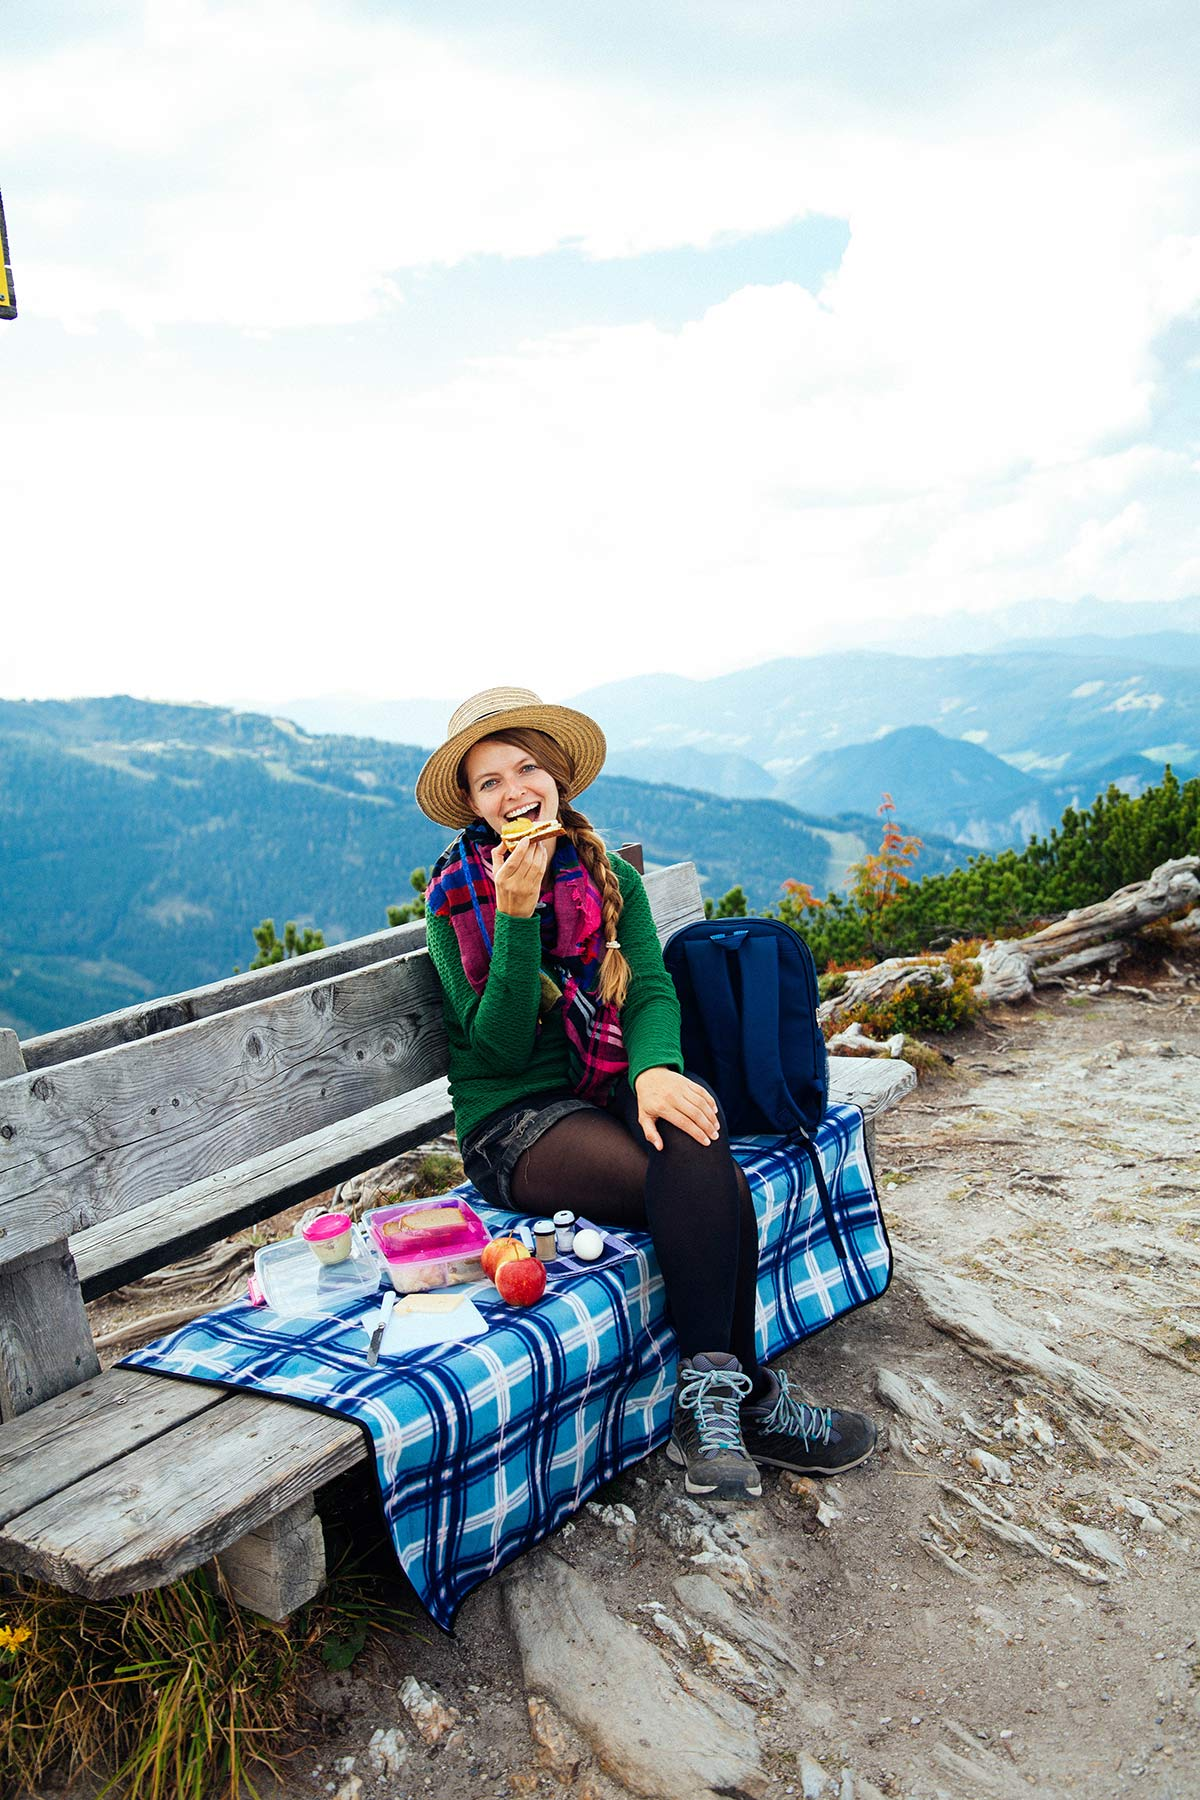 Picknick auf dem Berg